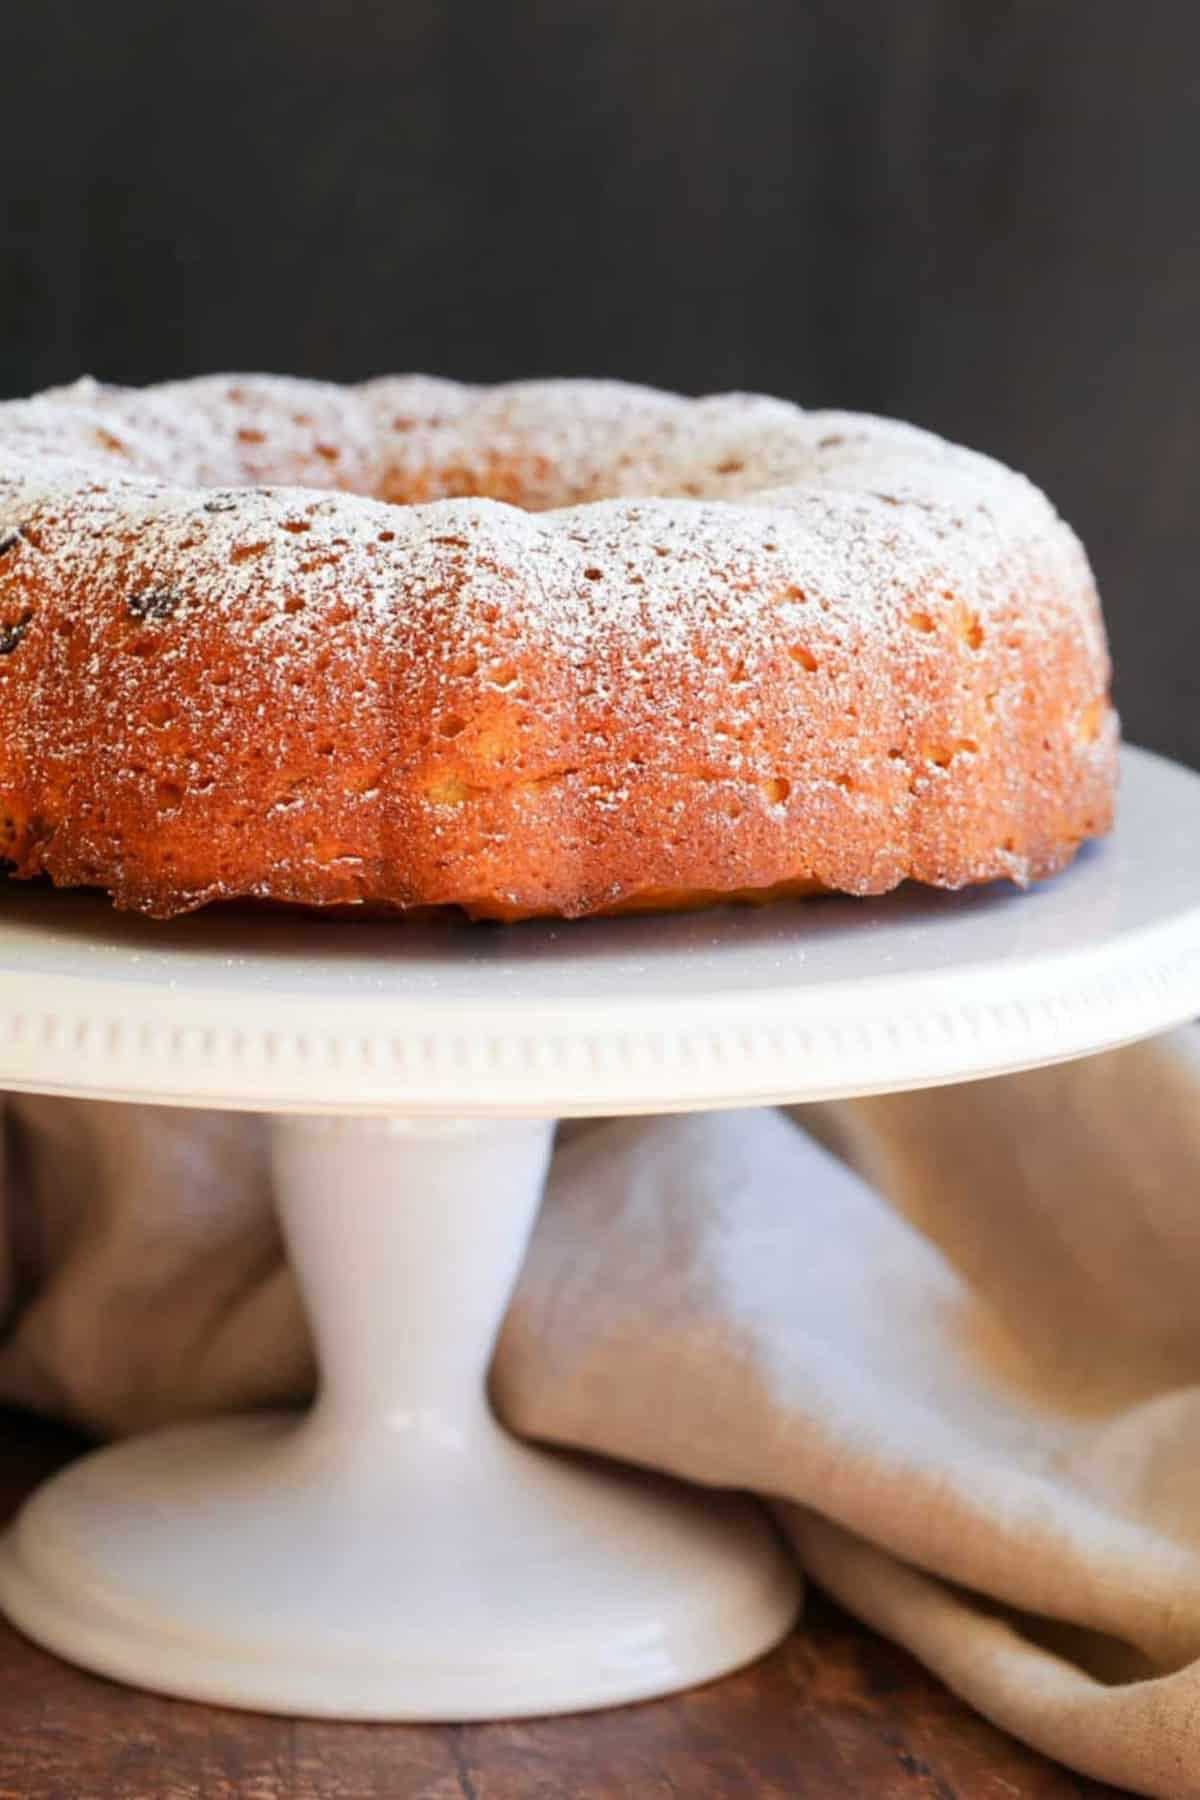 Combine ingredients for cake batter.